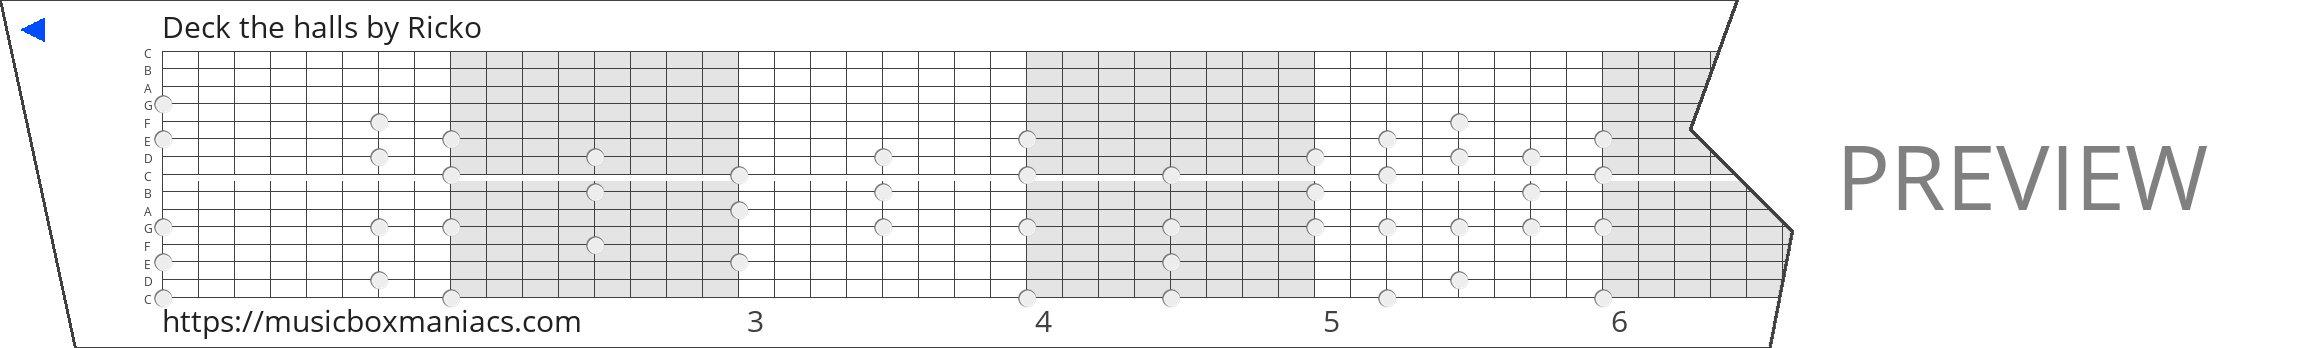 Deck the halls 15 note music box paper strip